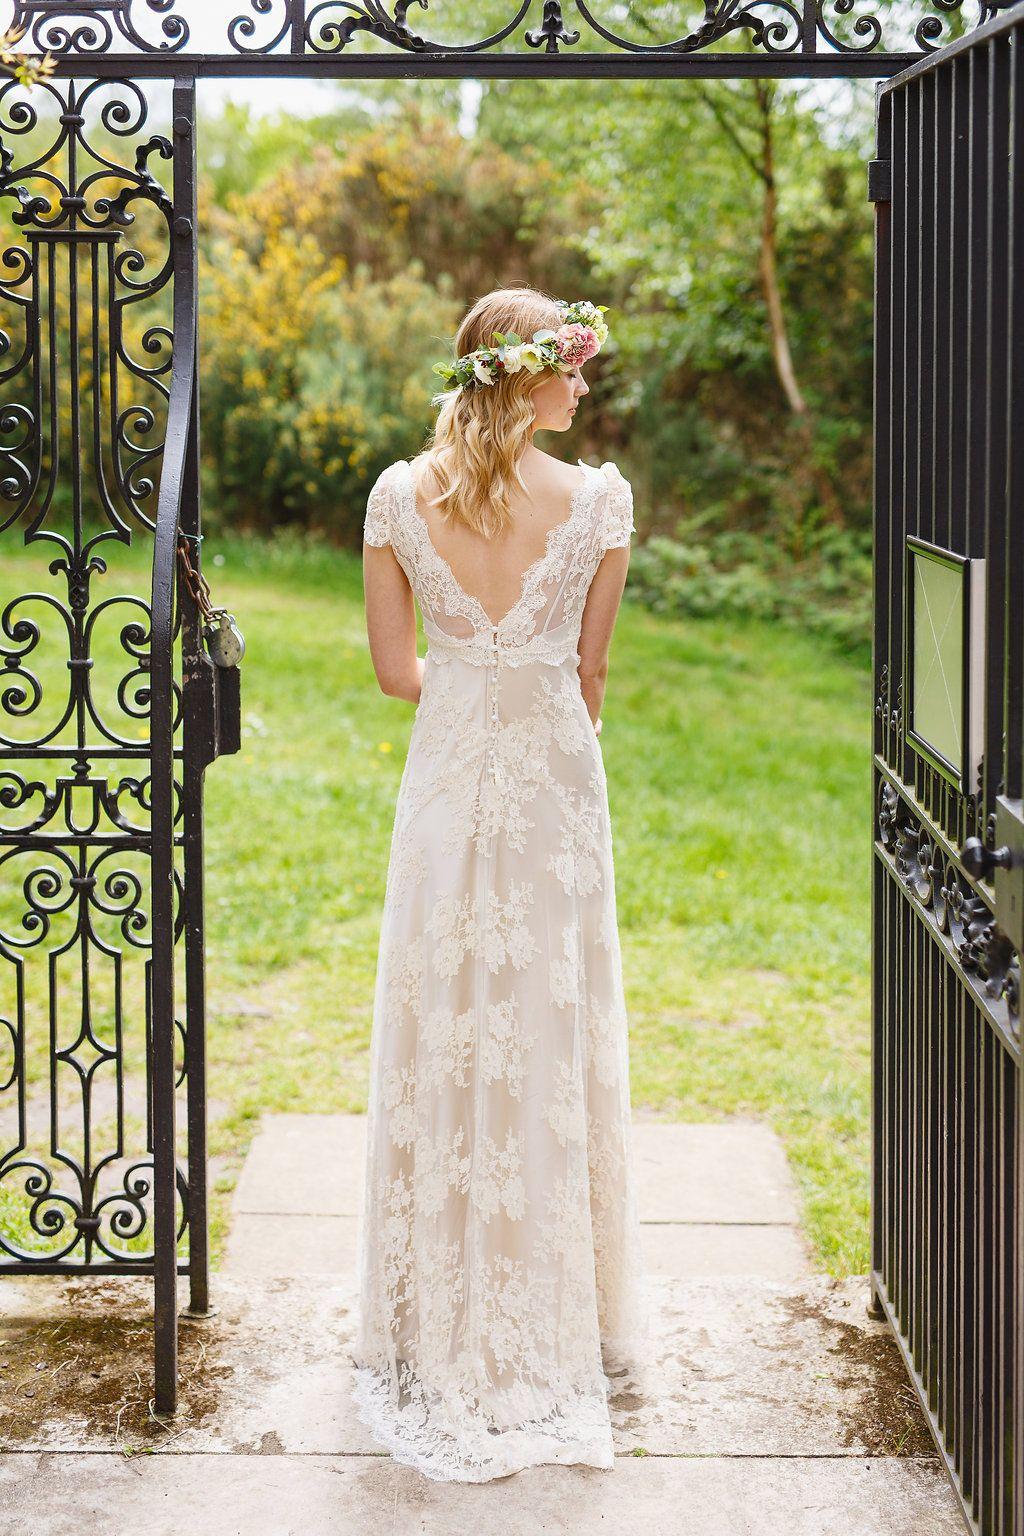 French lace boho style wedding dress by dana bolton wedding french lace boho style wedding dress by dana bolton ombrellifo Gallery